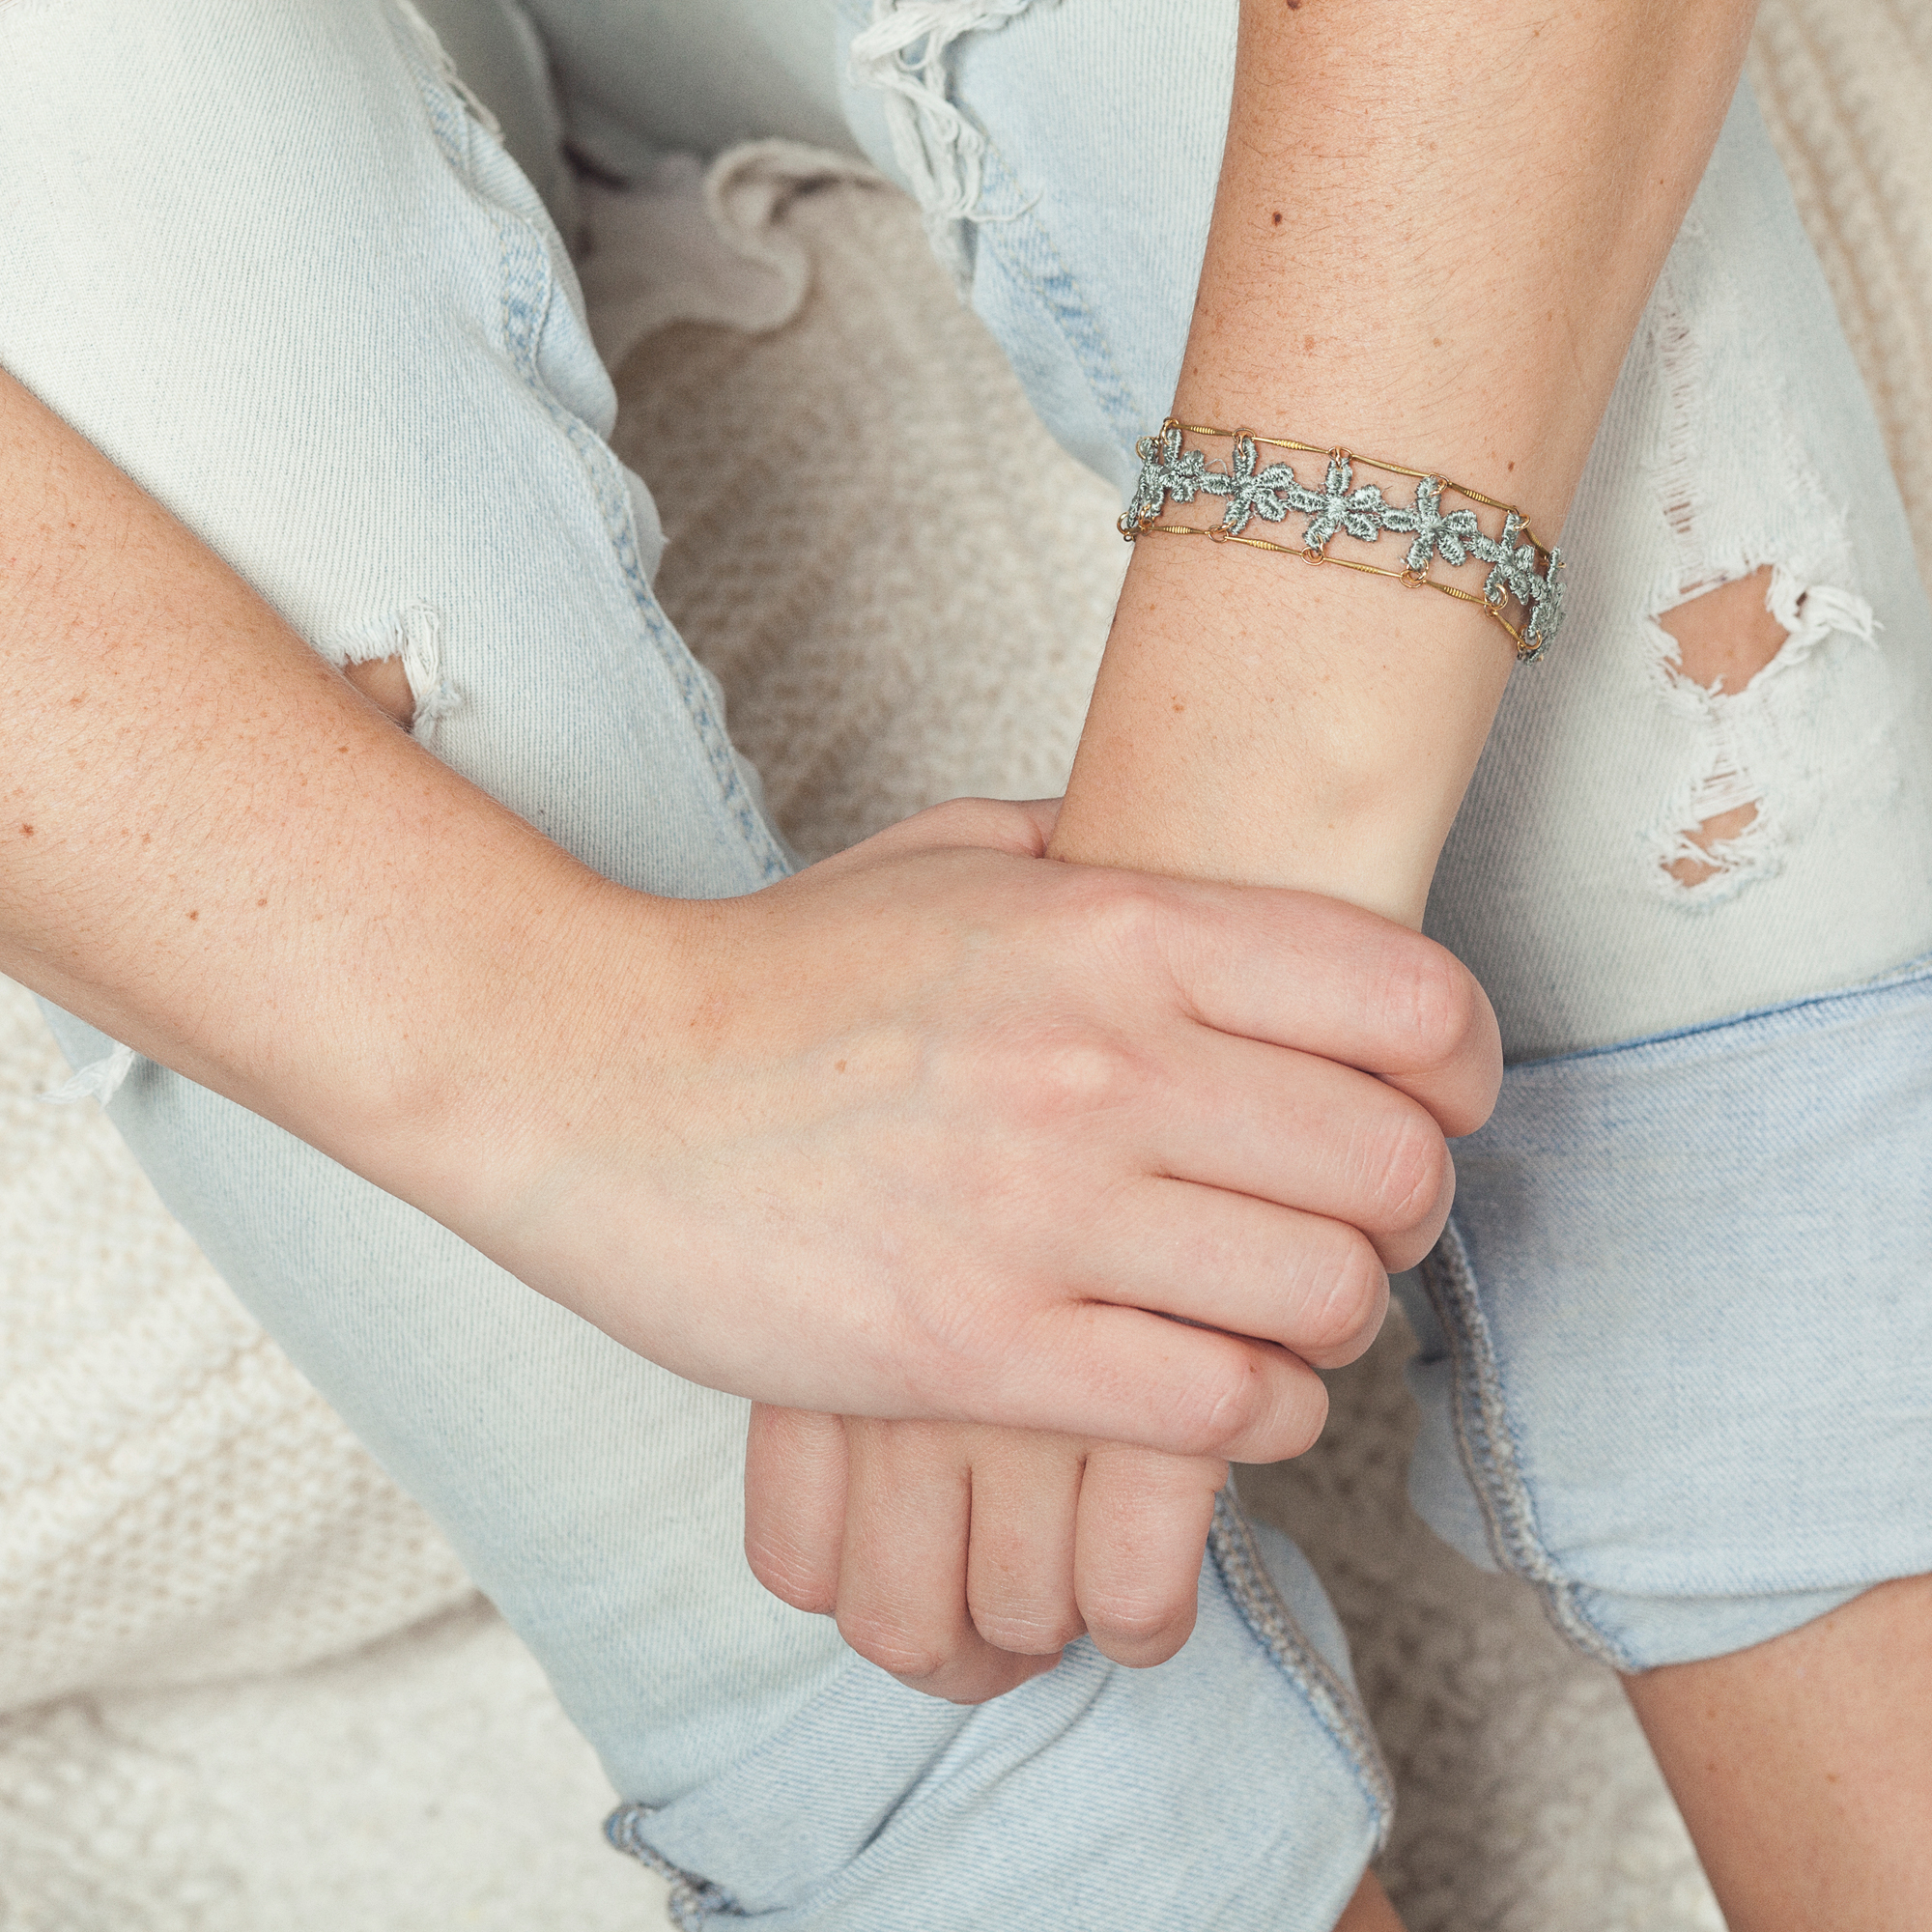 Amalfi bracelet (details here)